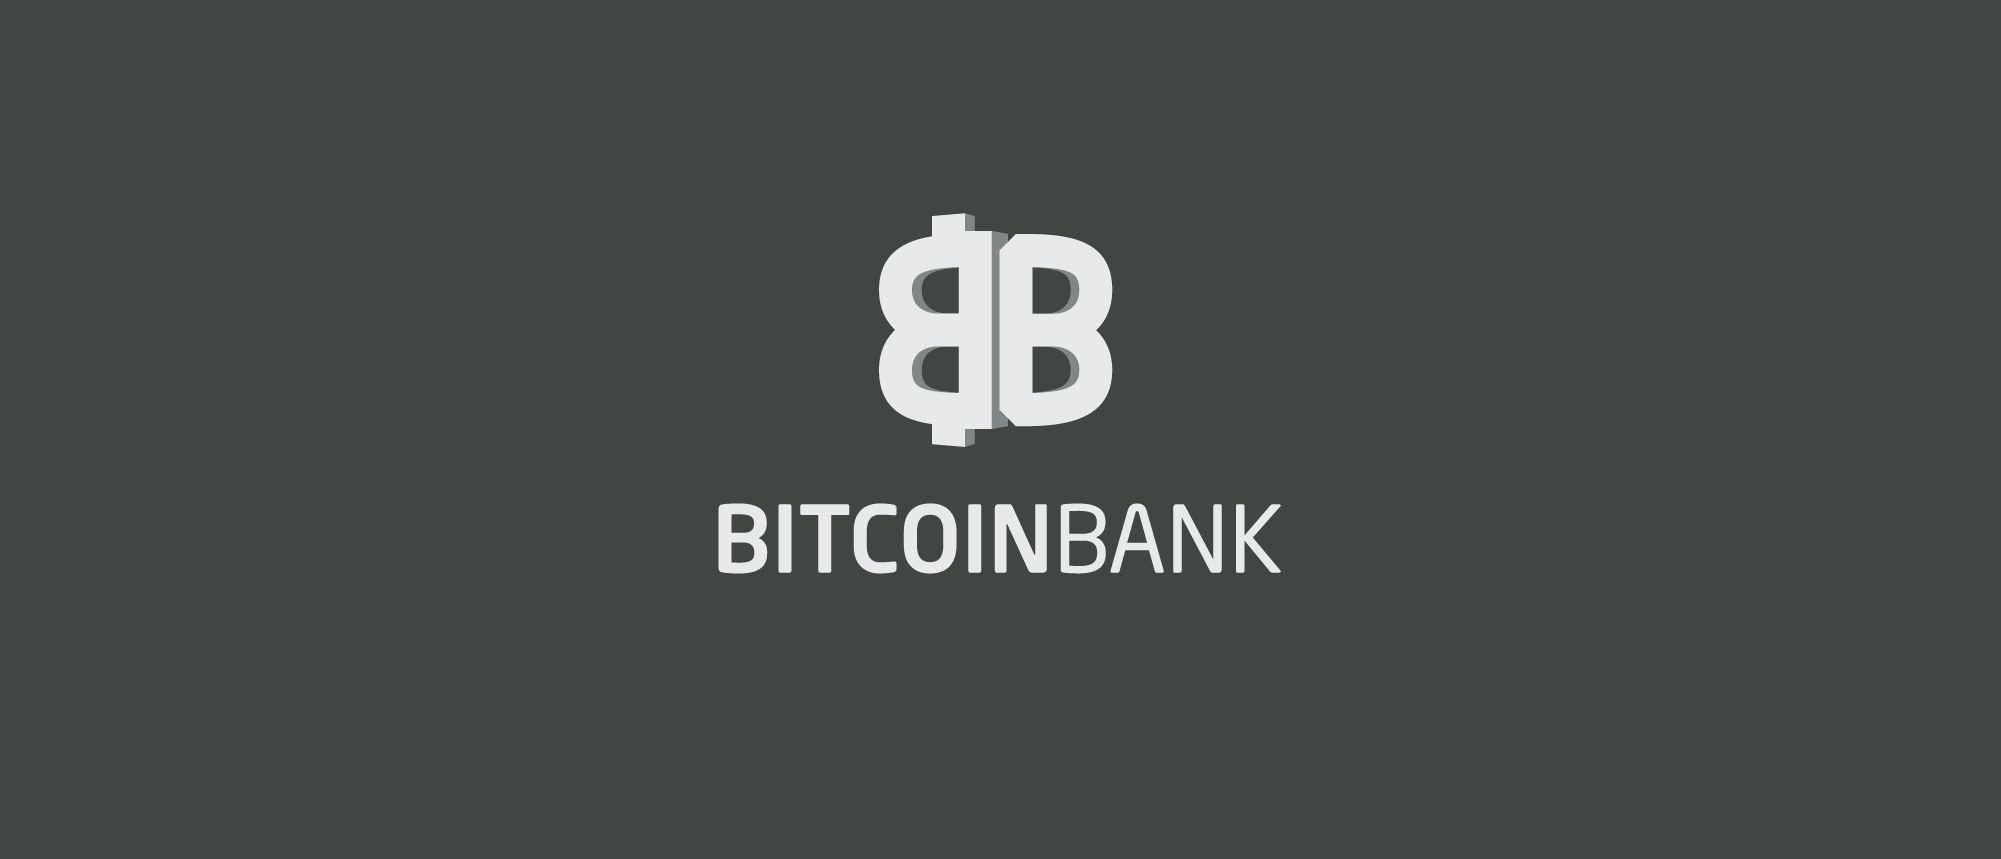 BitcoinBank - Логотип - дизайнер e5en